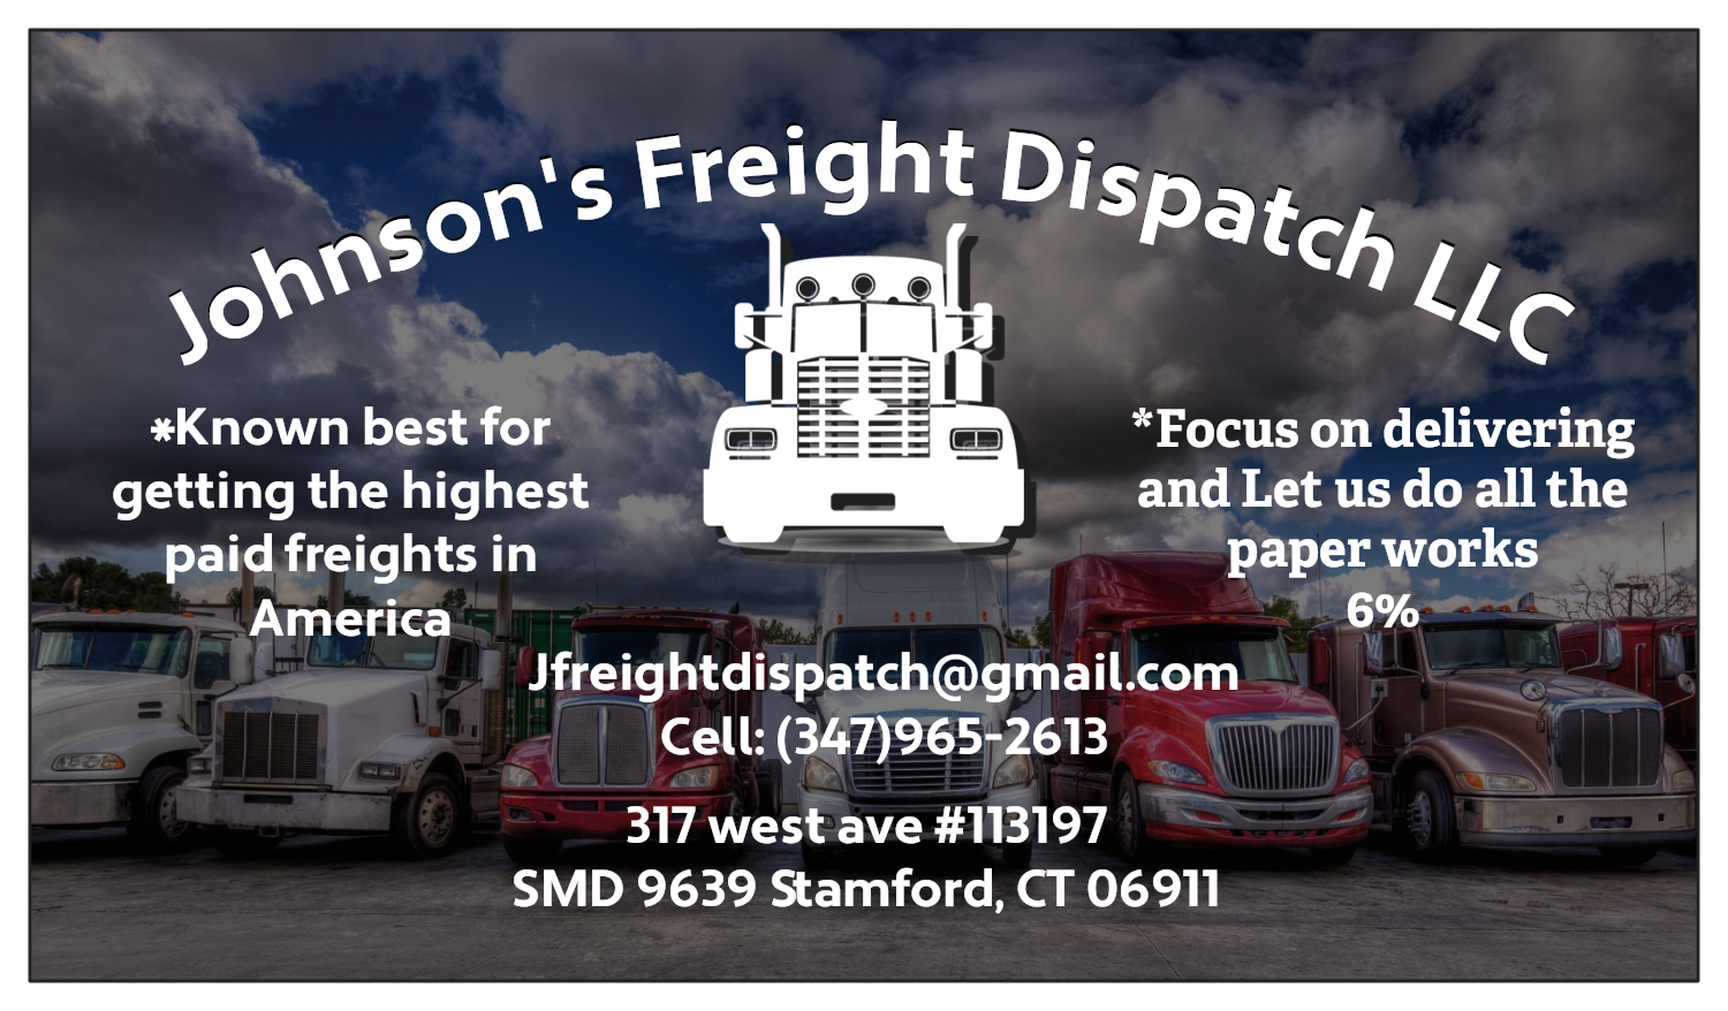 Johnson's freight dispatch llc